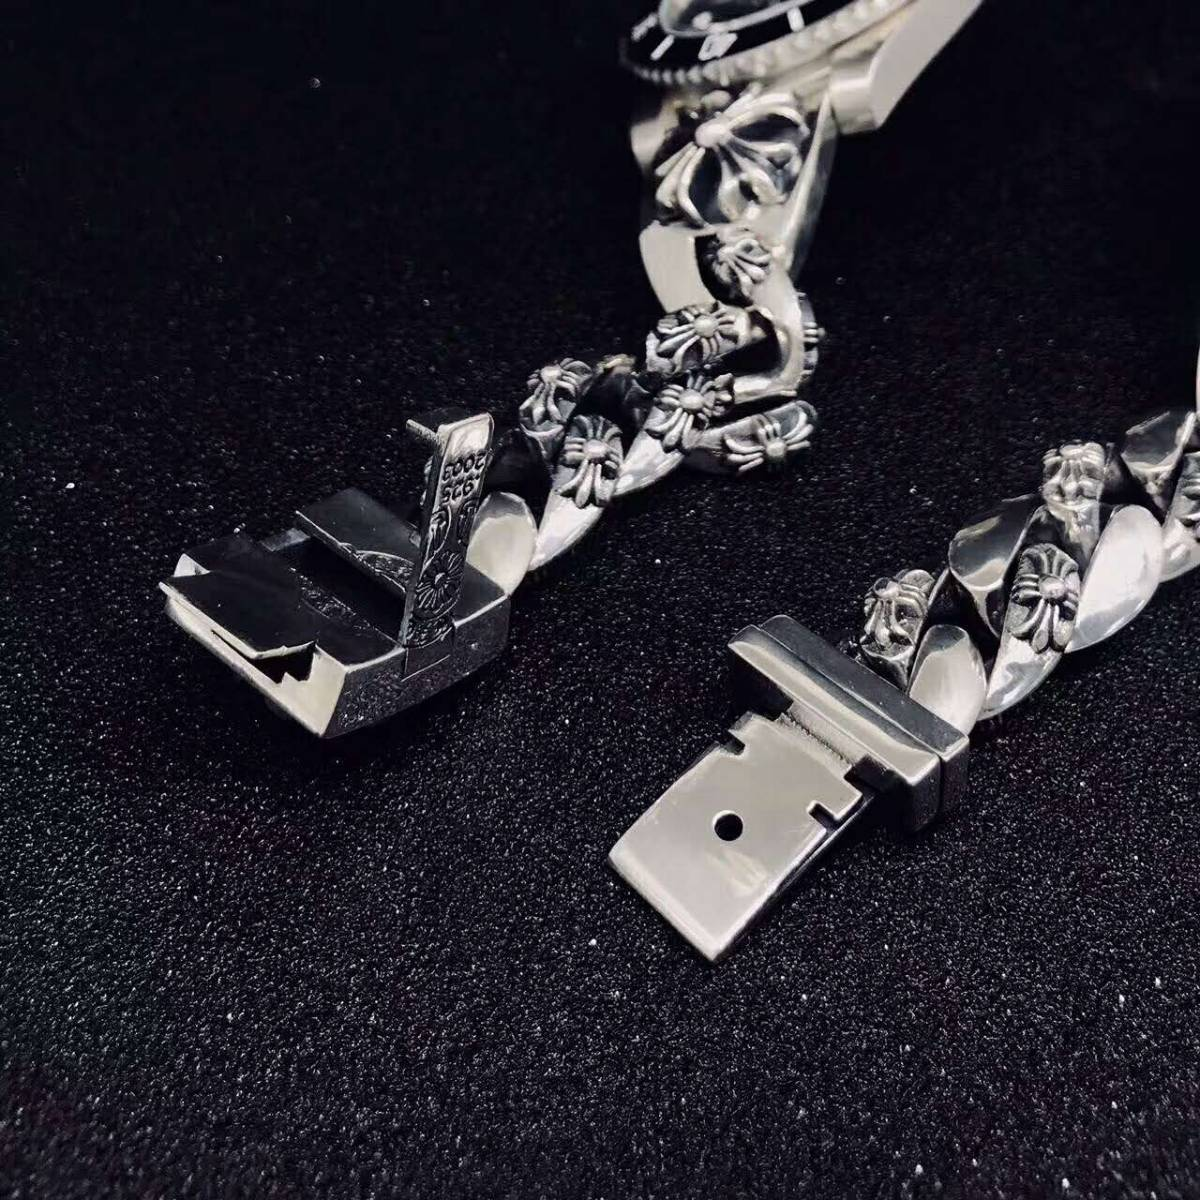 JF製 美品 自動巻き 高品質 1:1 SSS メンズ腕時計 noob製 42mm_画像2